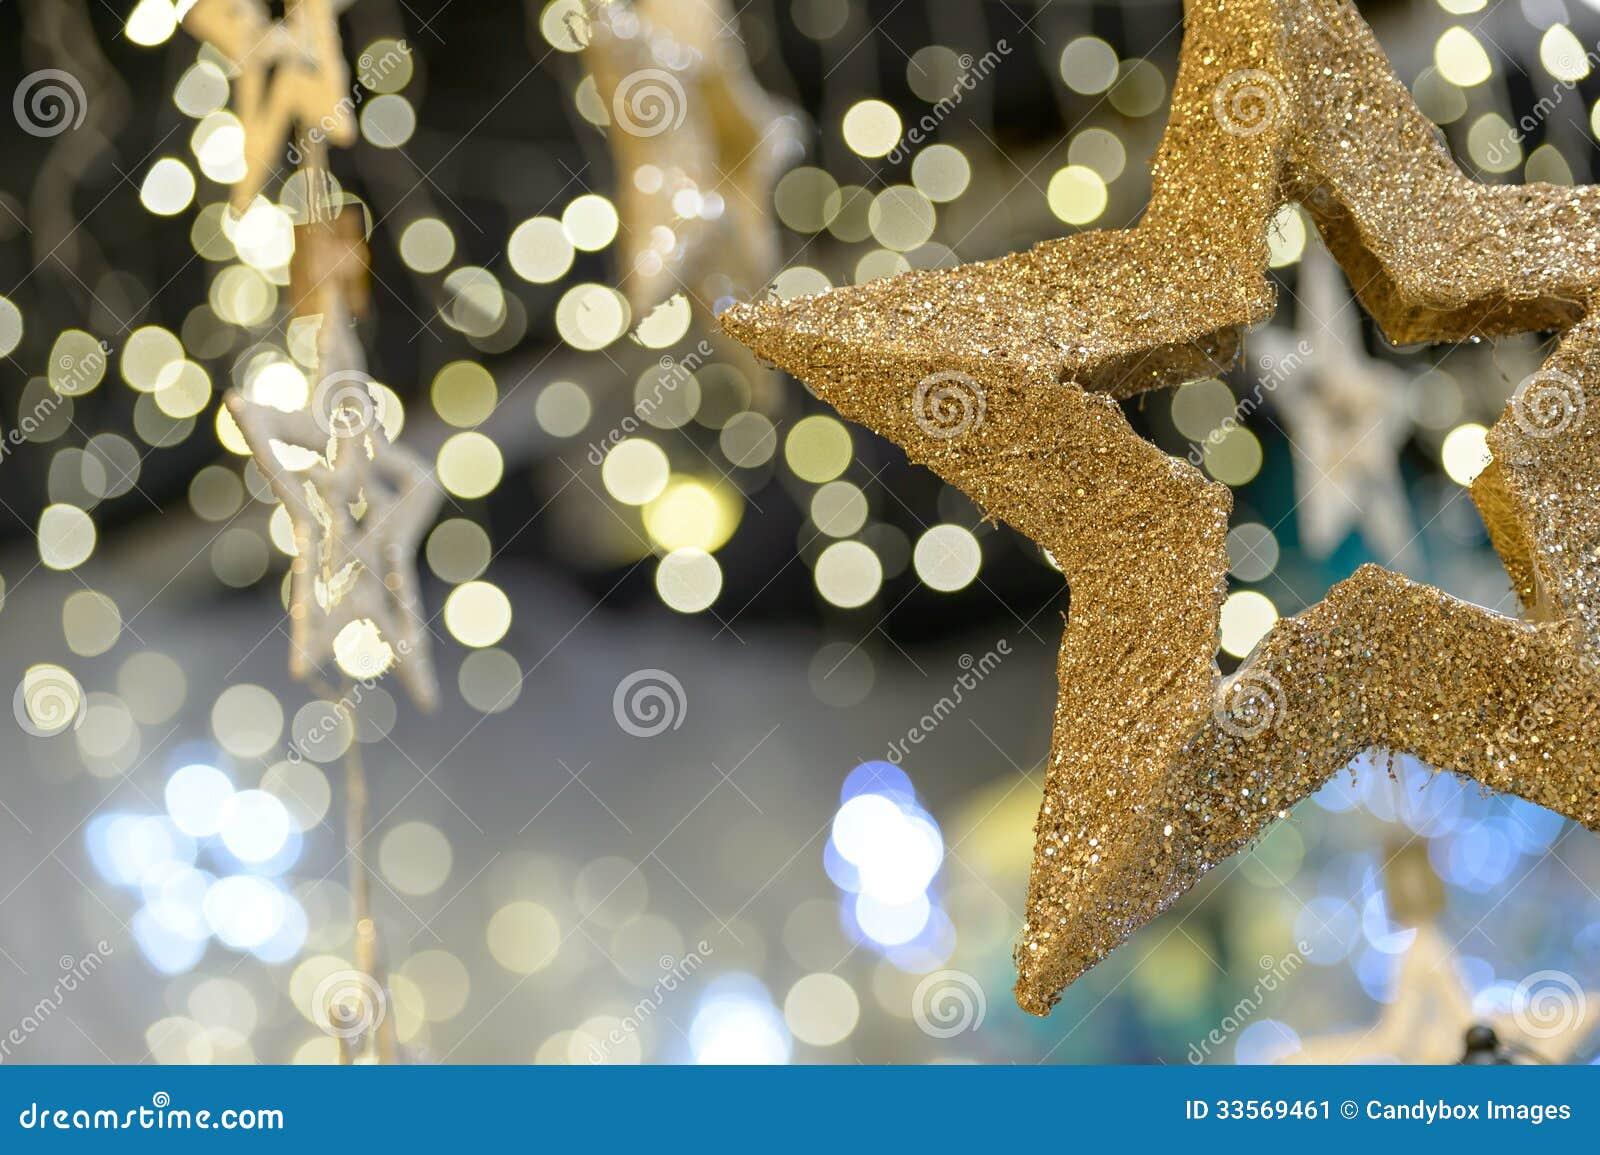 Gold star ornaments - Star Christmas Ornament